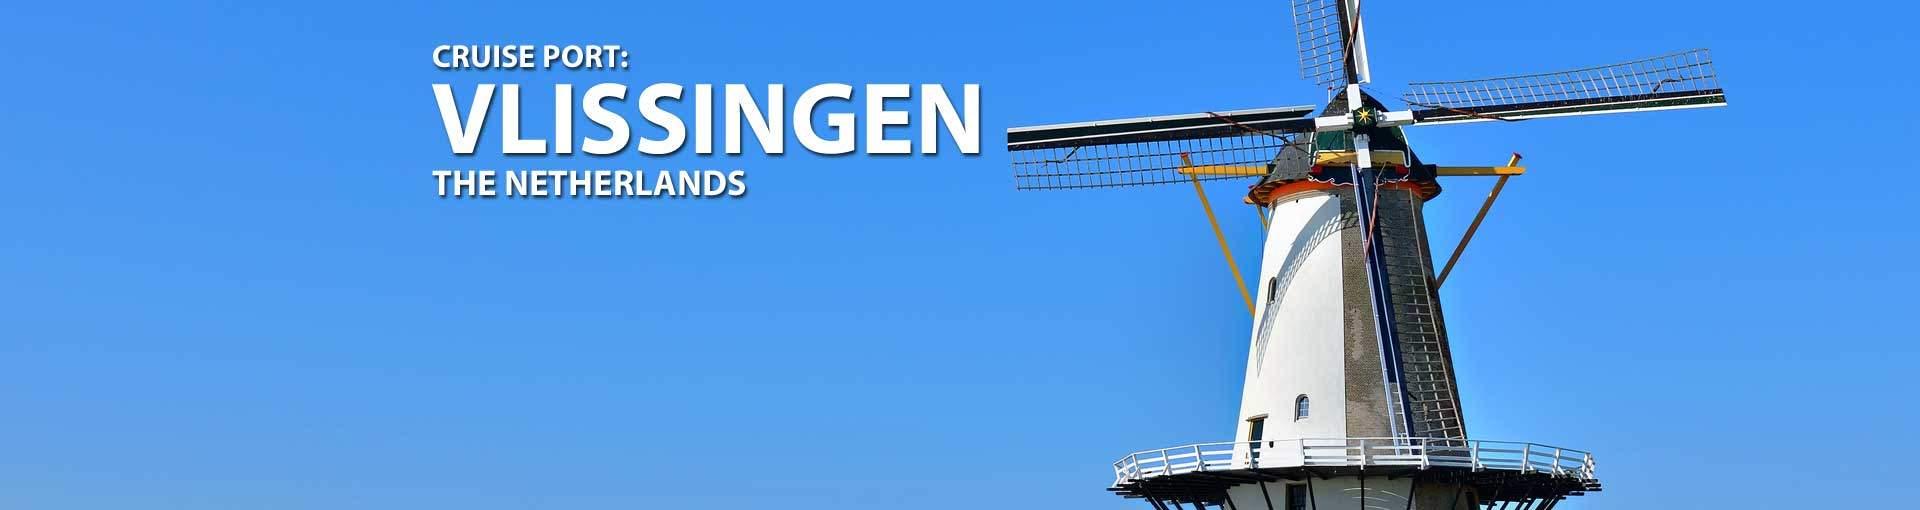 Cruises to Vlissingen, Netherlands